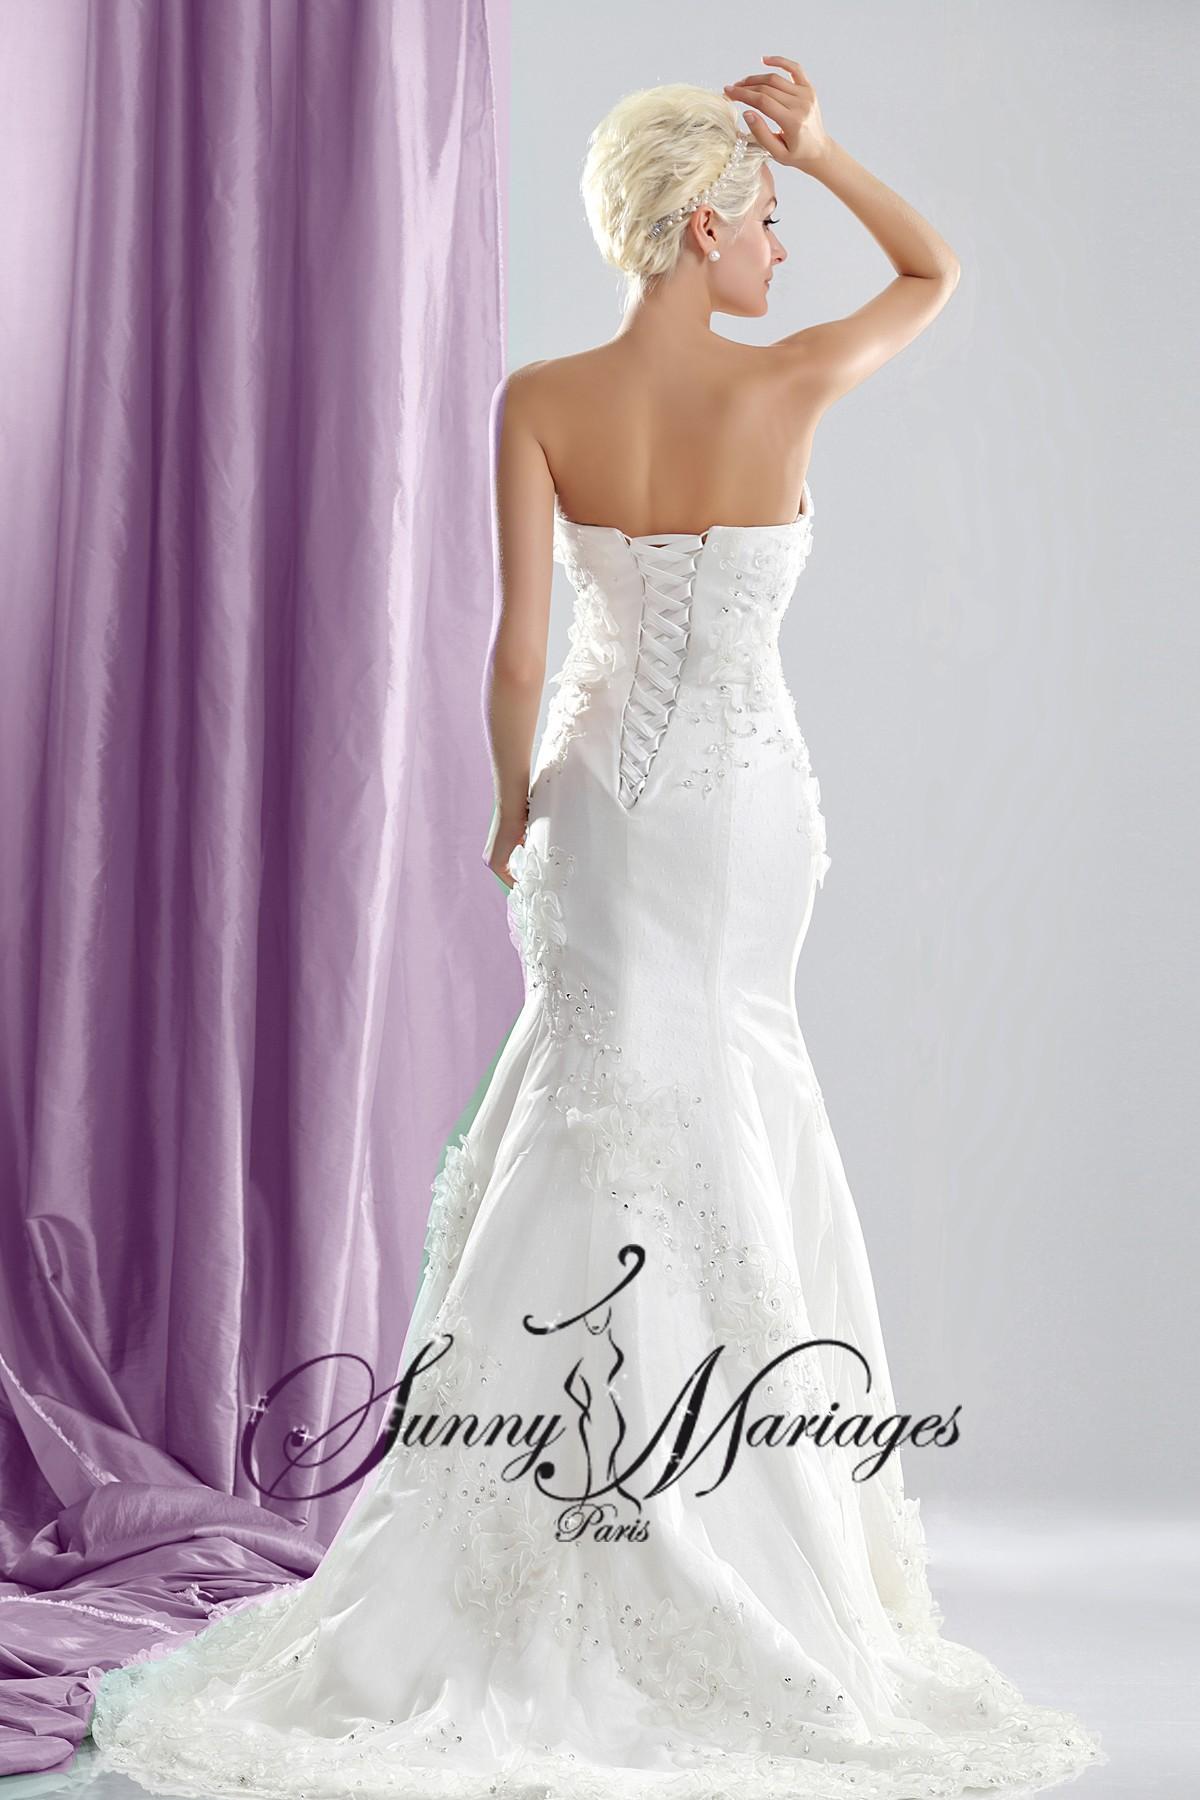 robe de mariage originale forme trompete ou sirene bustier strass en vente en ligne sunny mariage. Black Bedroom Furniture Sets. Home Design Ideas